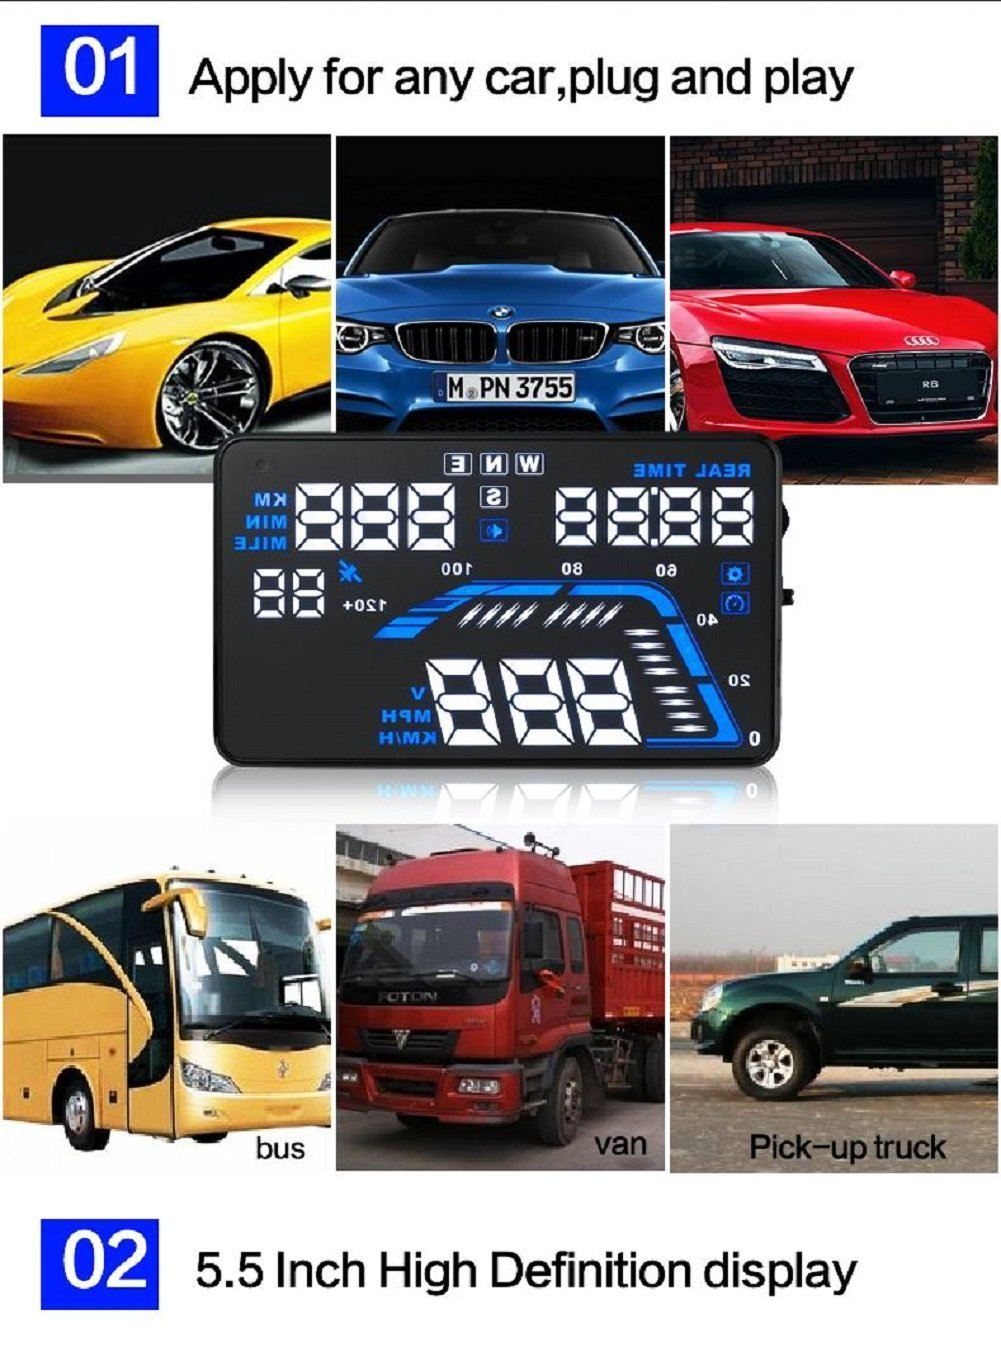 MRCARTOOL 5.5'' Q7 Car HUD Head Up Display Speedometers Car Overspeed GPS Warning Dashboard Windshield Projector Reflective Film by AUTOOL (Image #3)